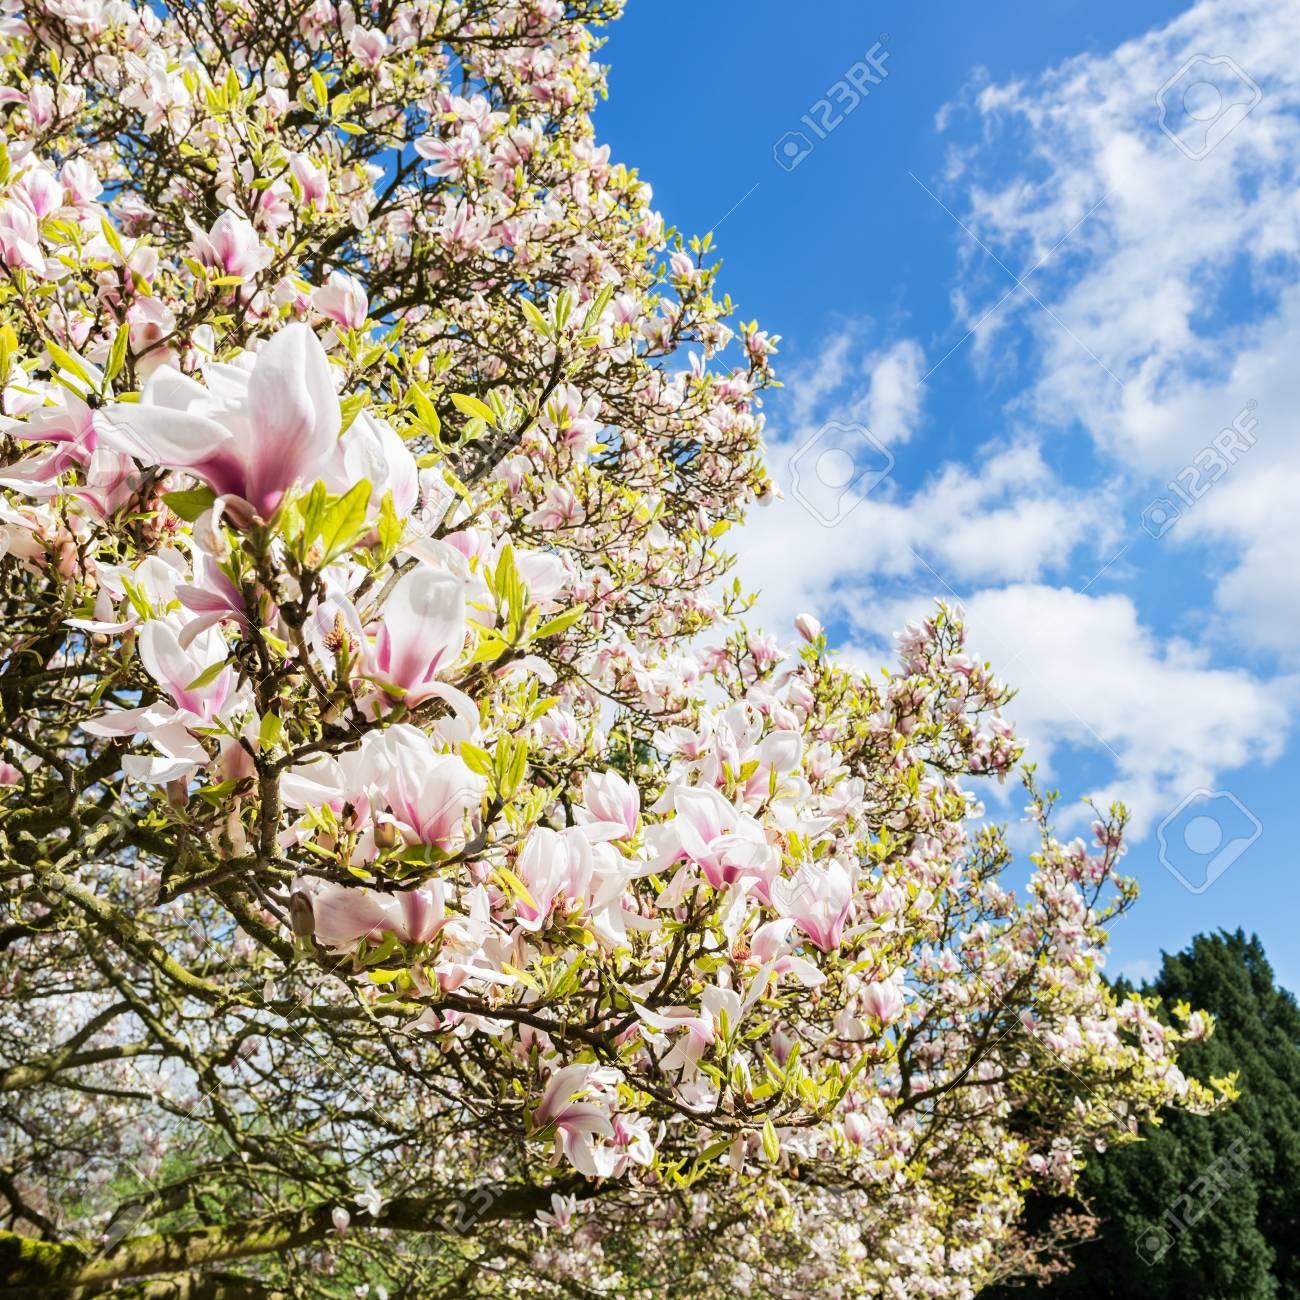 Beautiful light pink or purple magnolia tree with blooming flowers beautiful light pink or purple magnolia tree with blooming flowers during springtime in english garden mightylinksfo